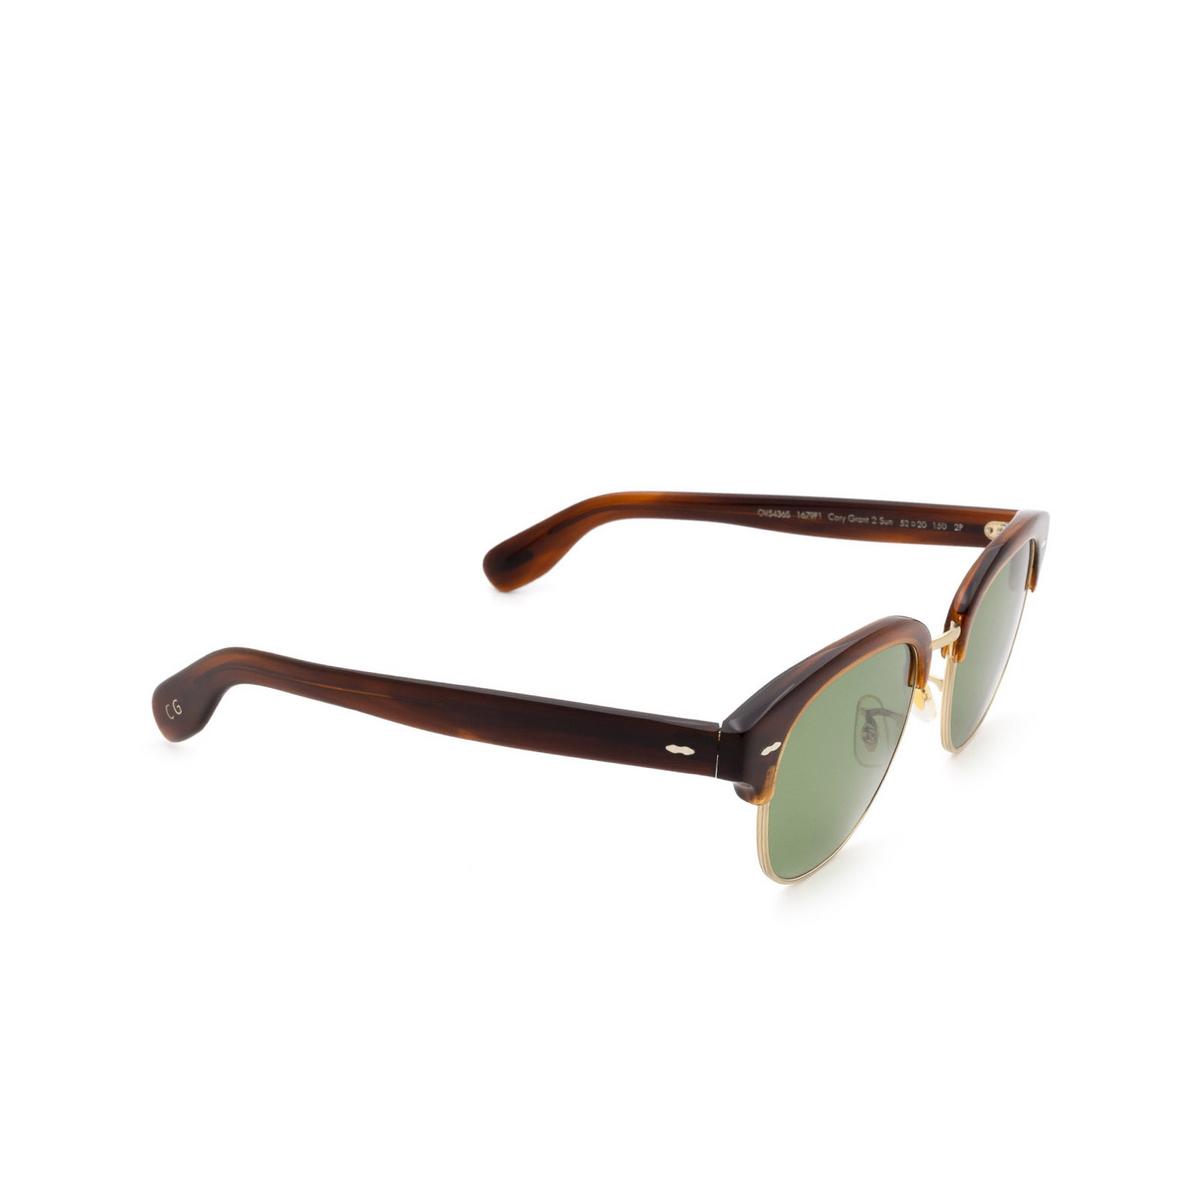 Oliver Peoples® Square Sunglasses: Cary Grant 2 Sun OV5436S color Grant Tortoise 1679P1.